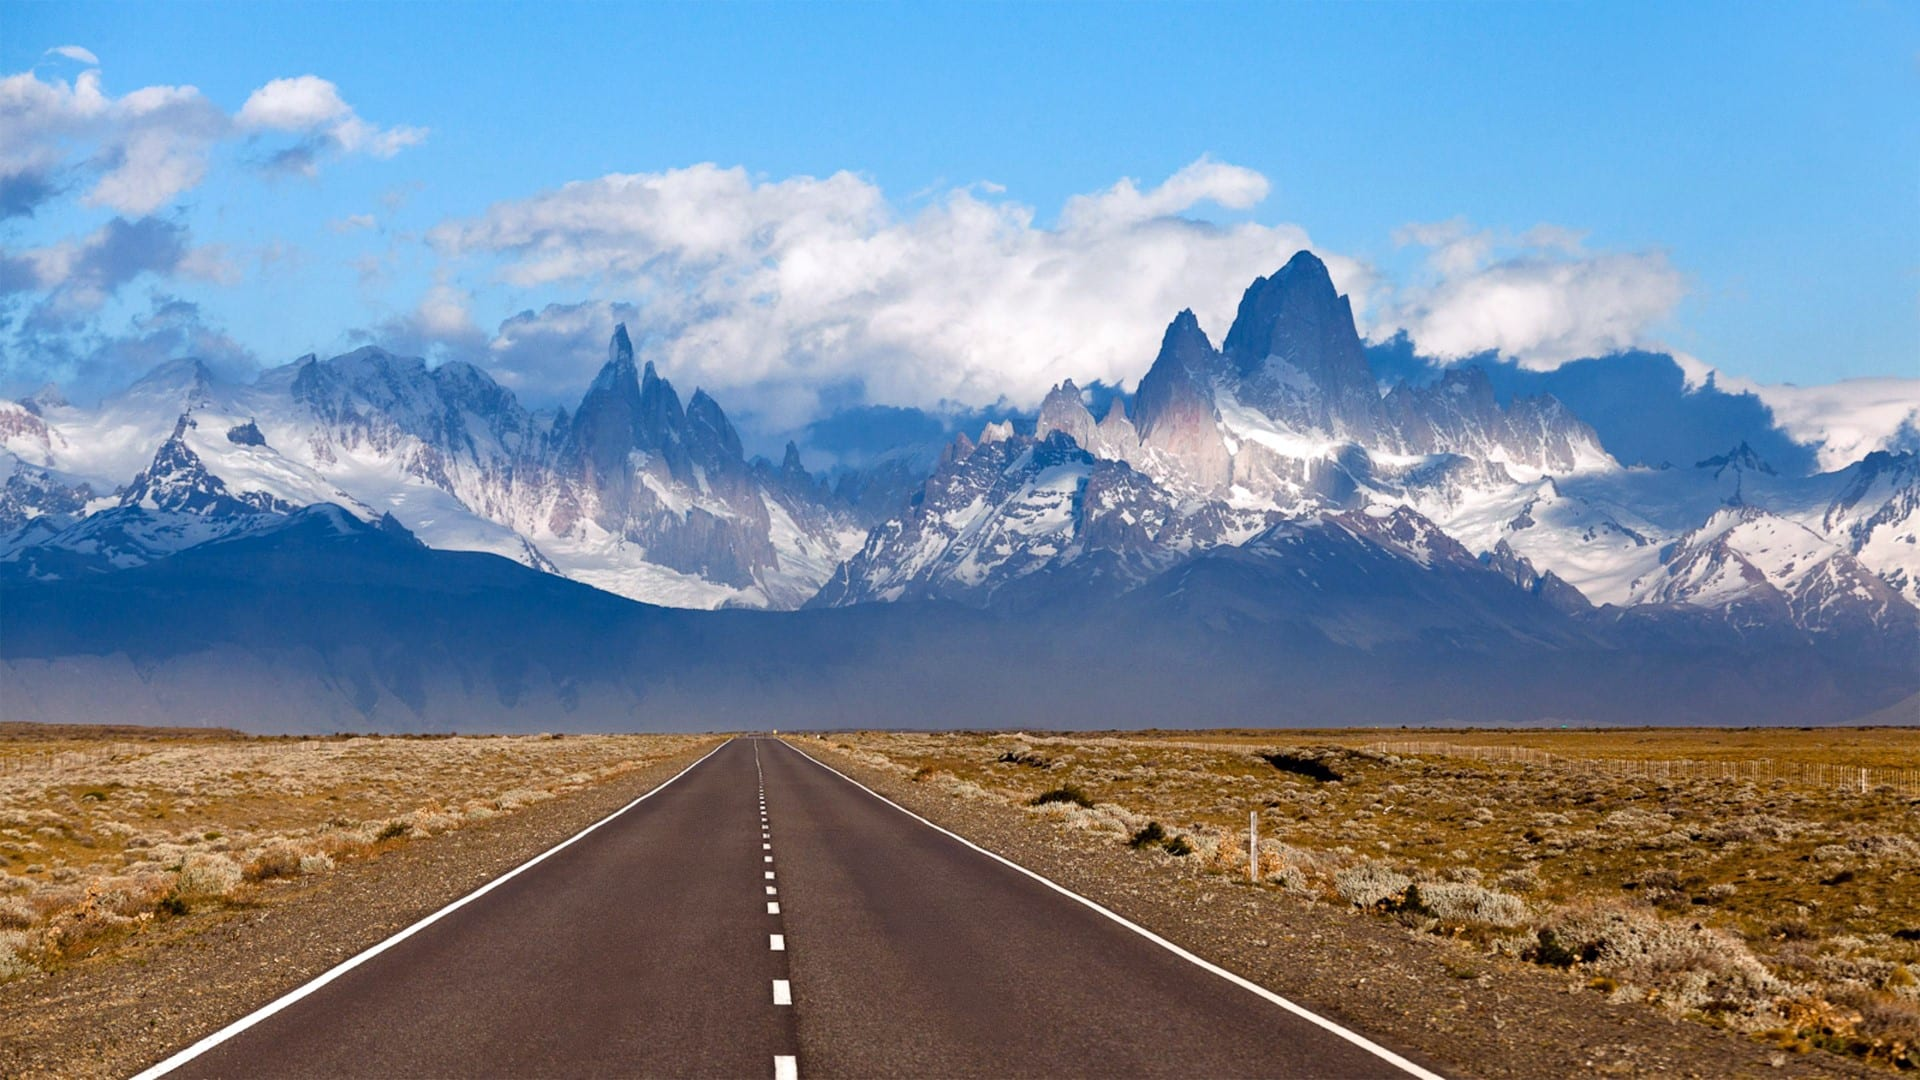 Bienvenue en Patagonie argentine et chilienne